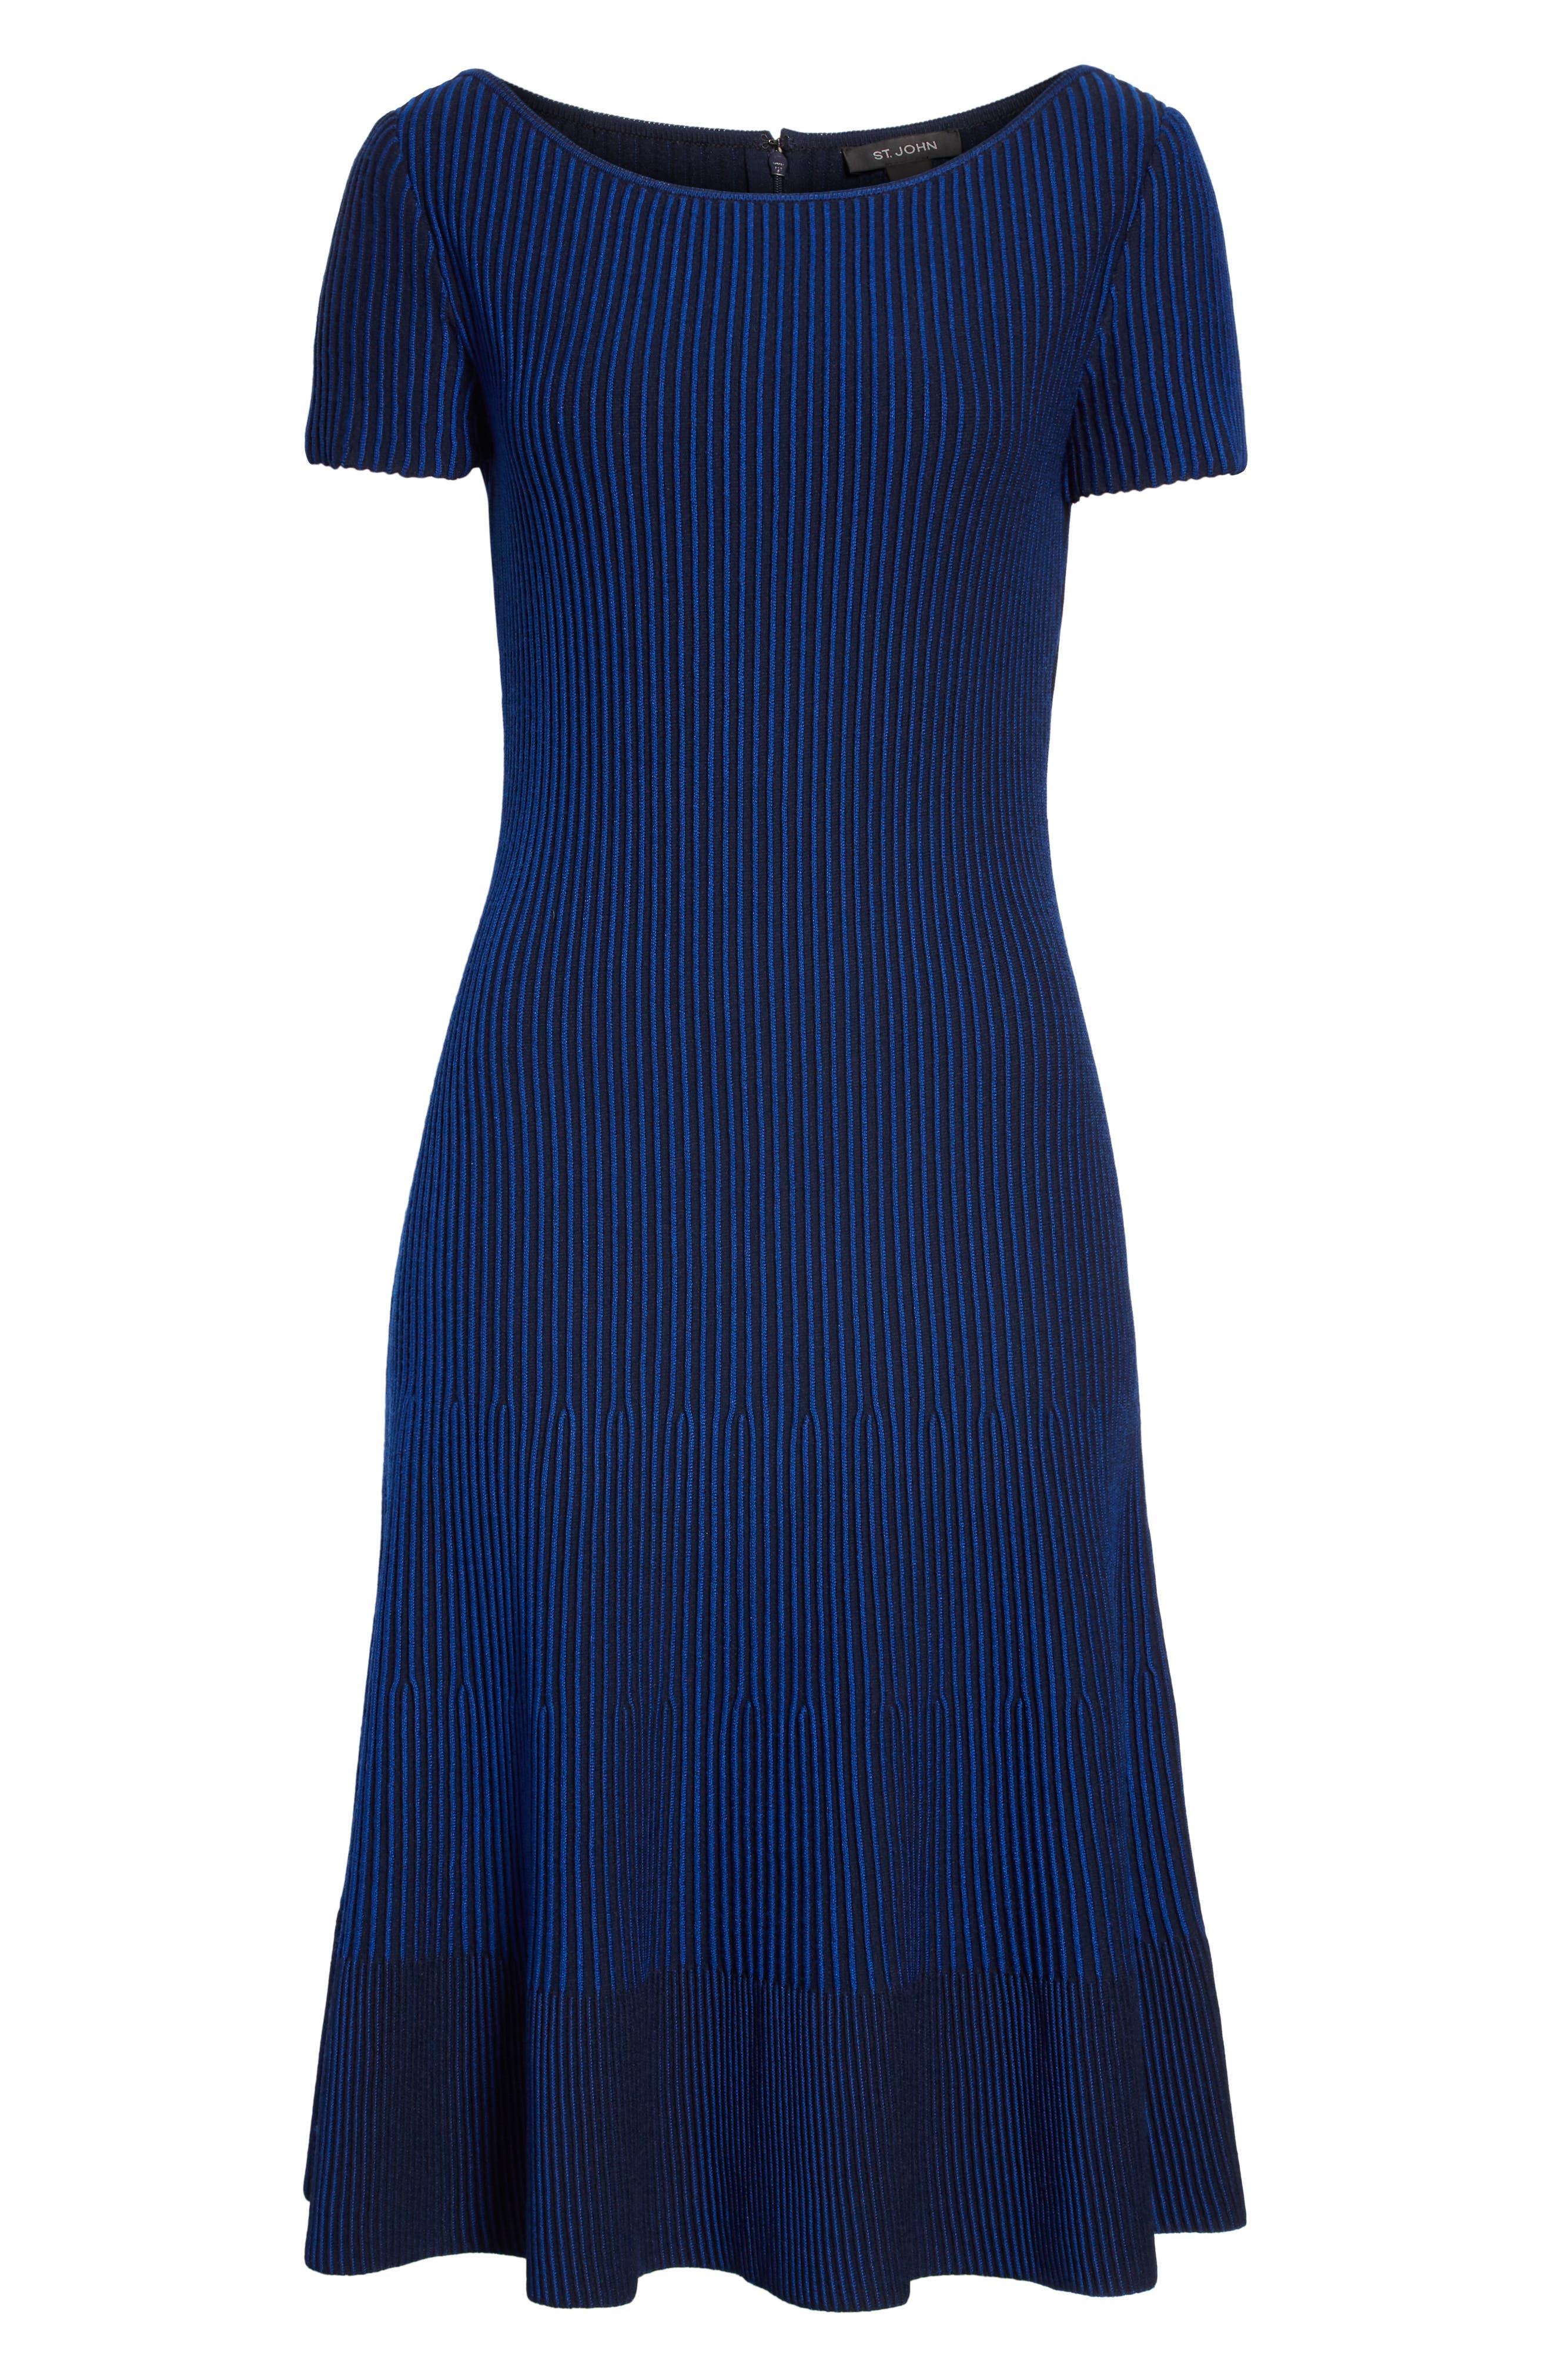 ST. JOHN COLLECTION, Ottoman Fit & Flare Sweater Dress, Alternate thumbnail 7, color, AZUL/ NAVY MULTI